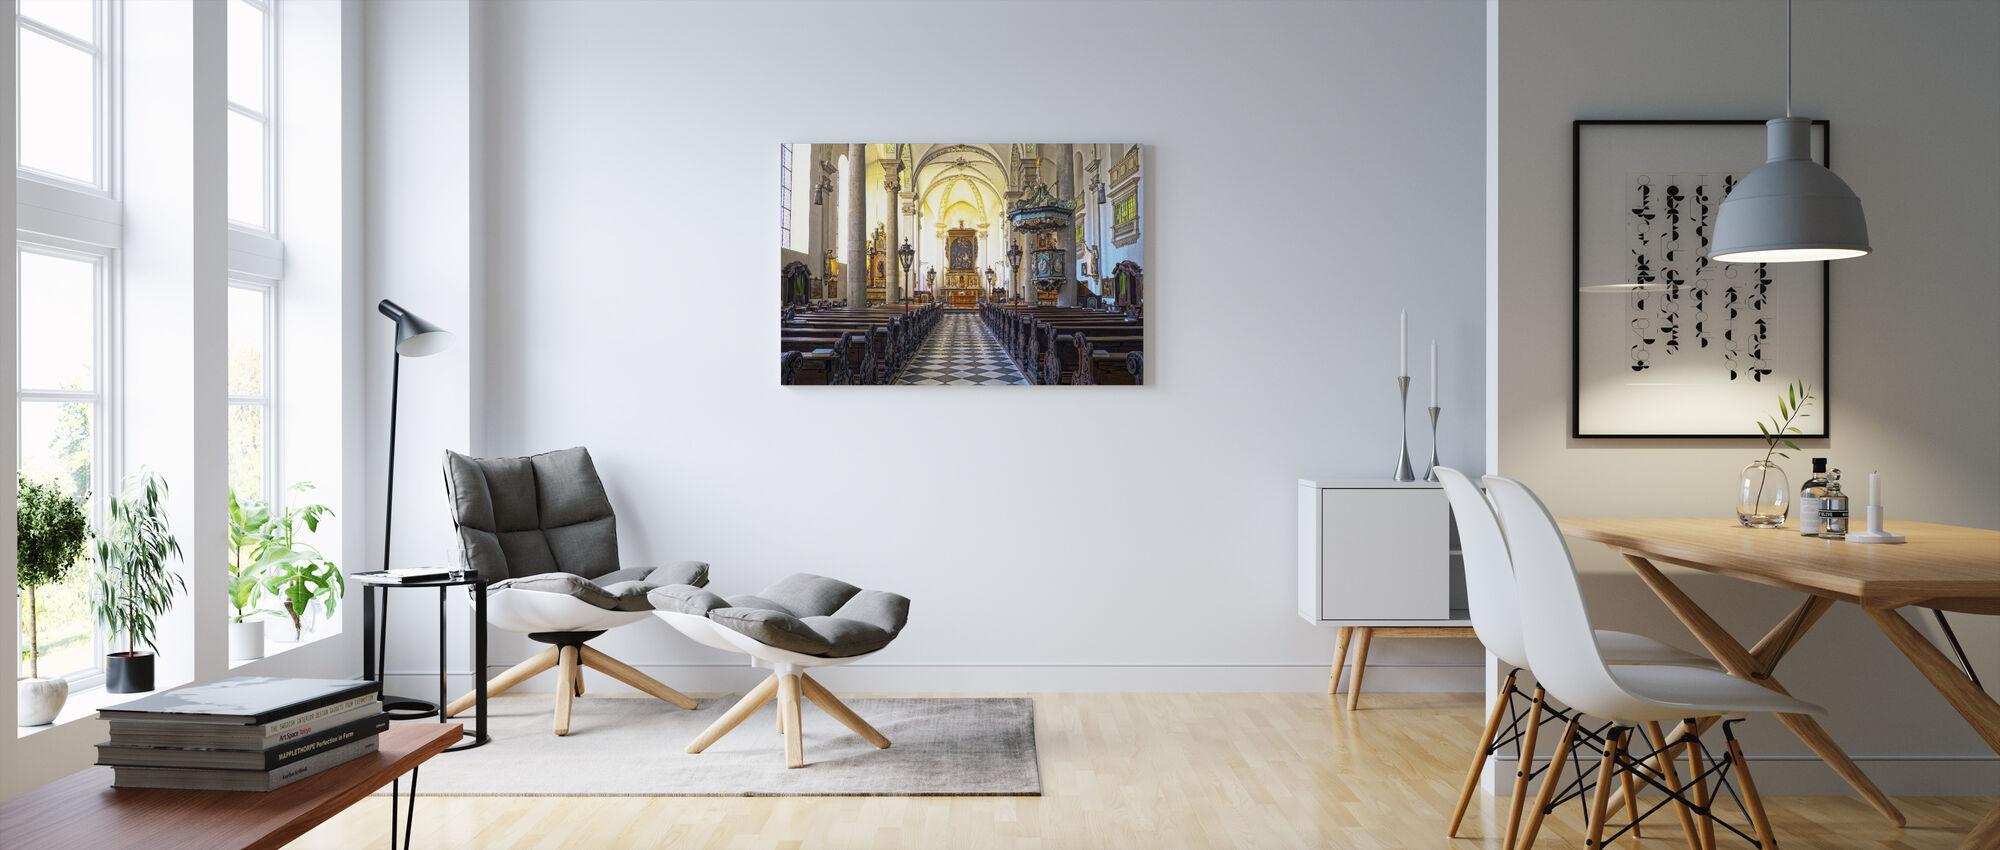 Church Pews - Canvas print - Living Room